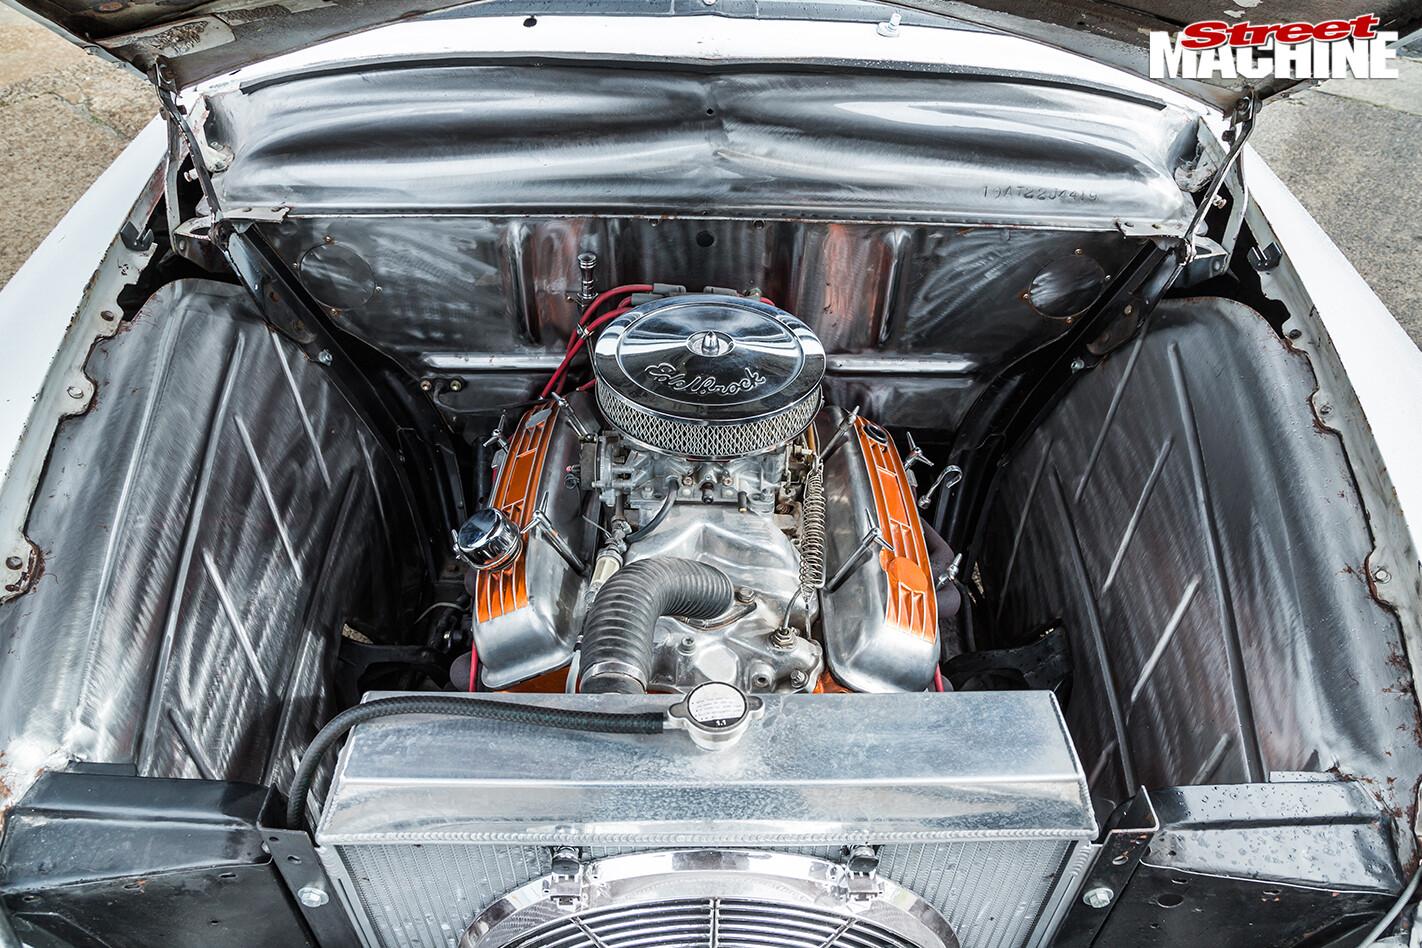 6950-ford -single -spinner -engine -bay